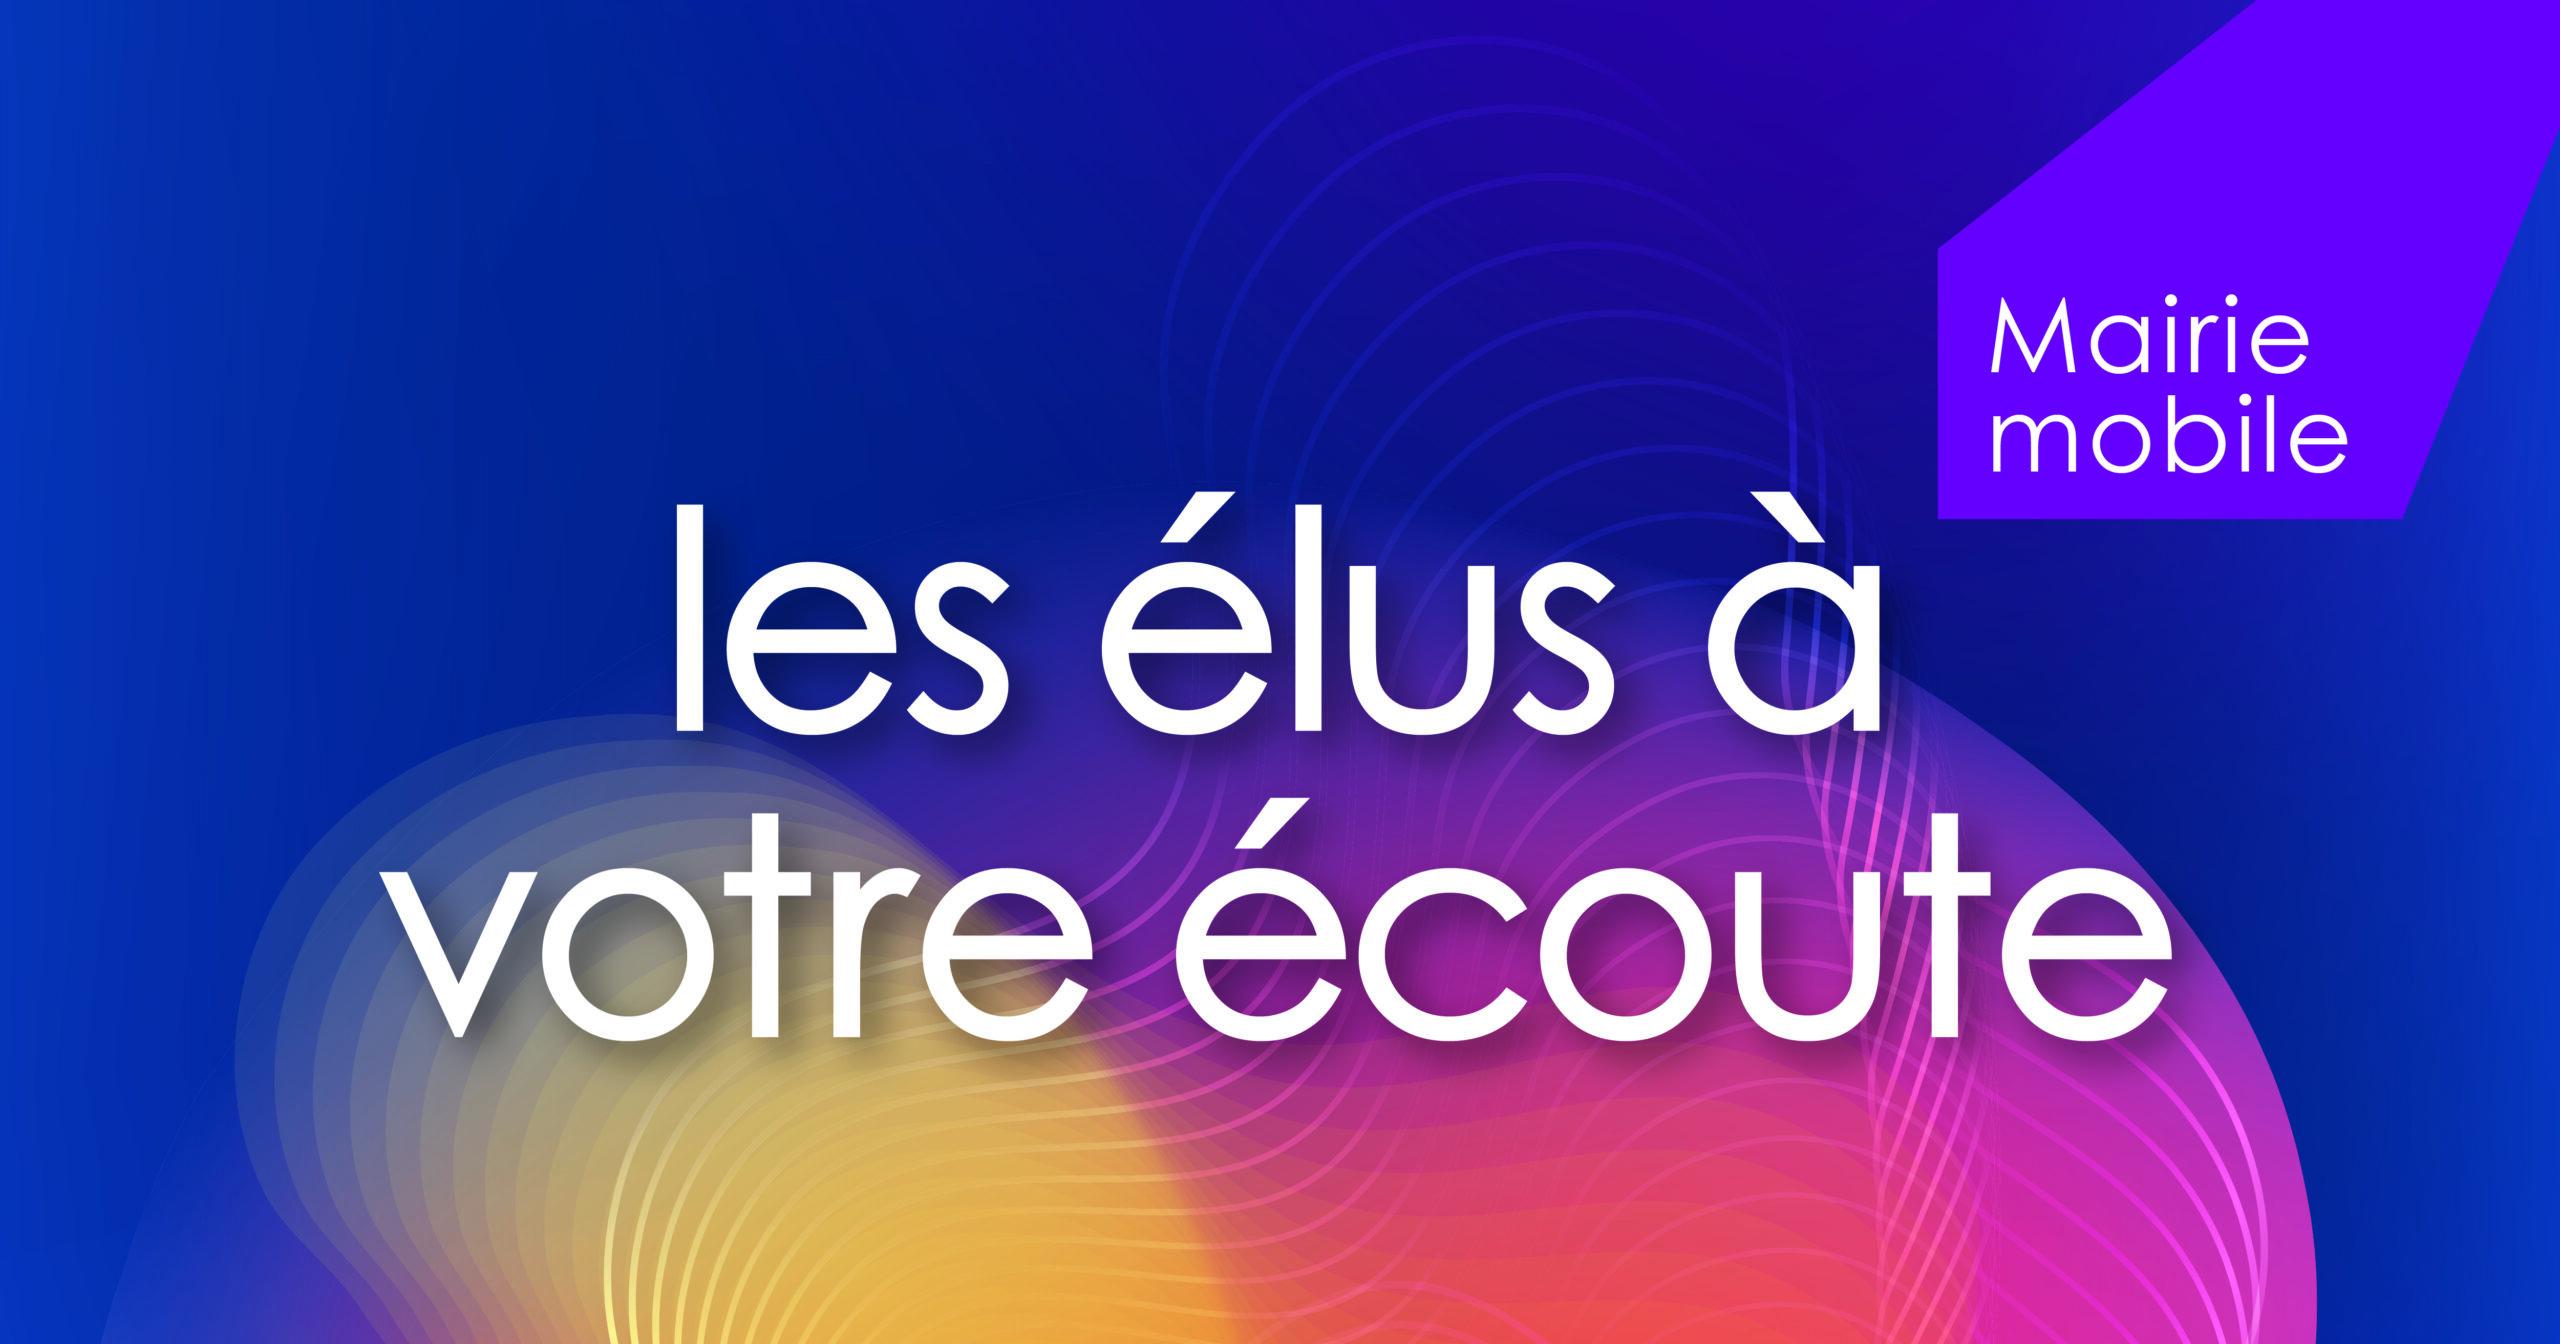 mairie_mobile